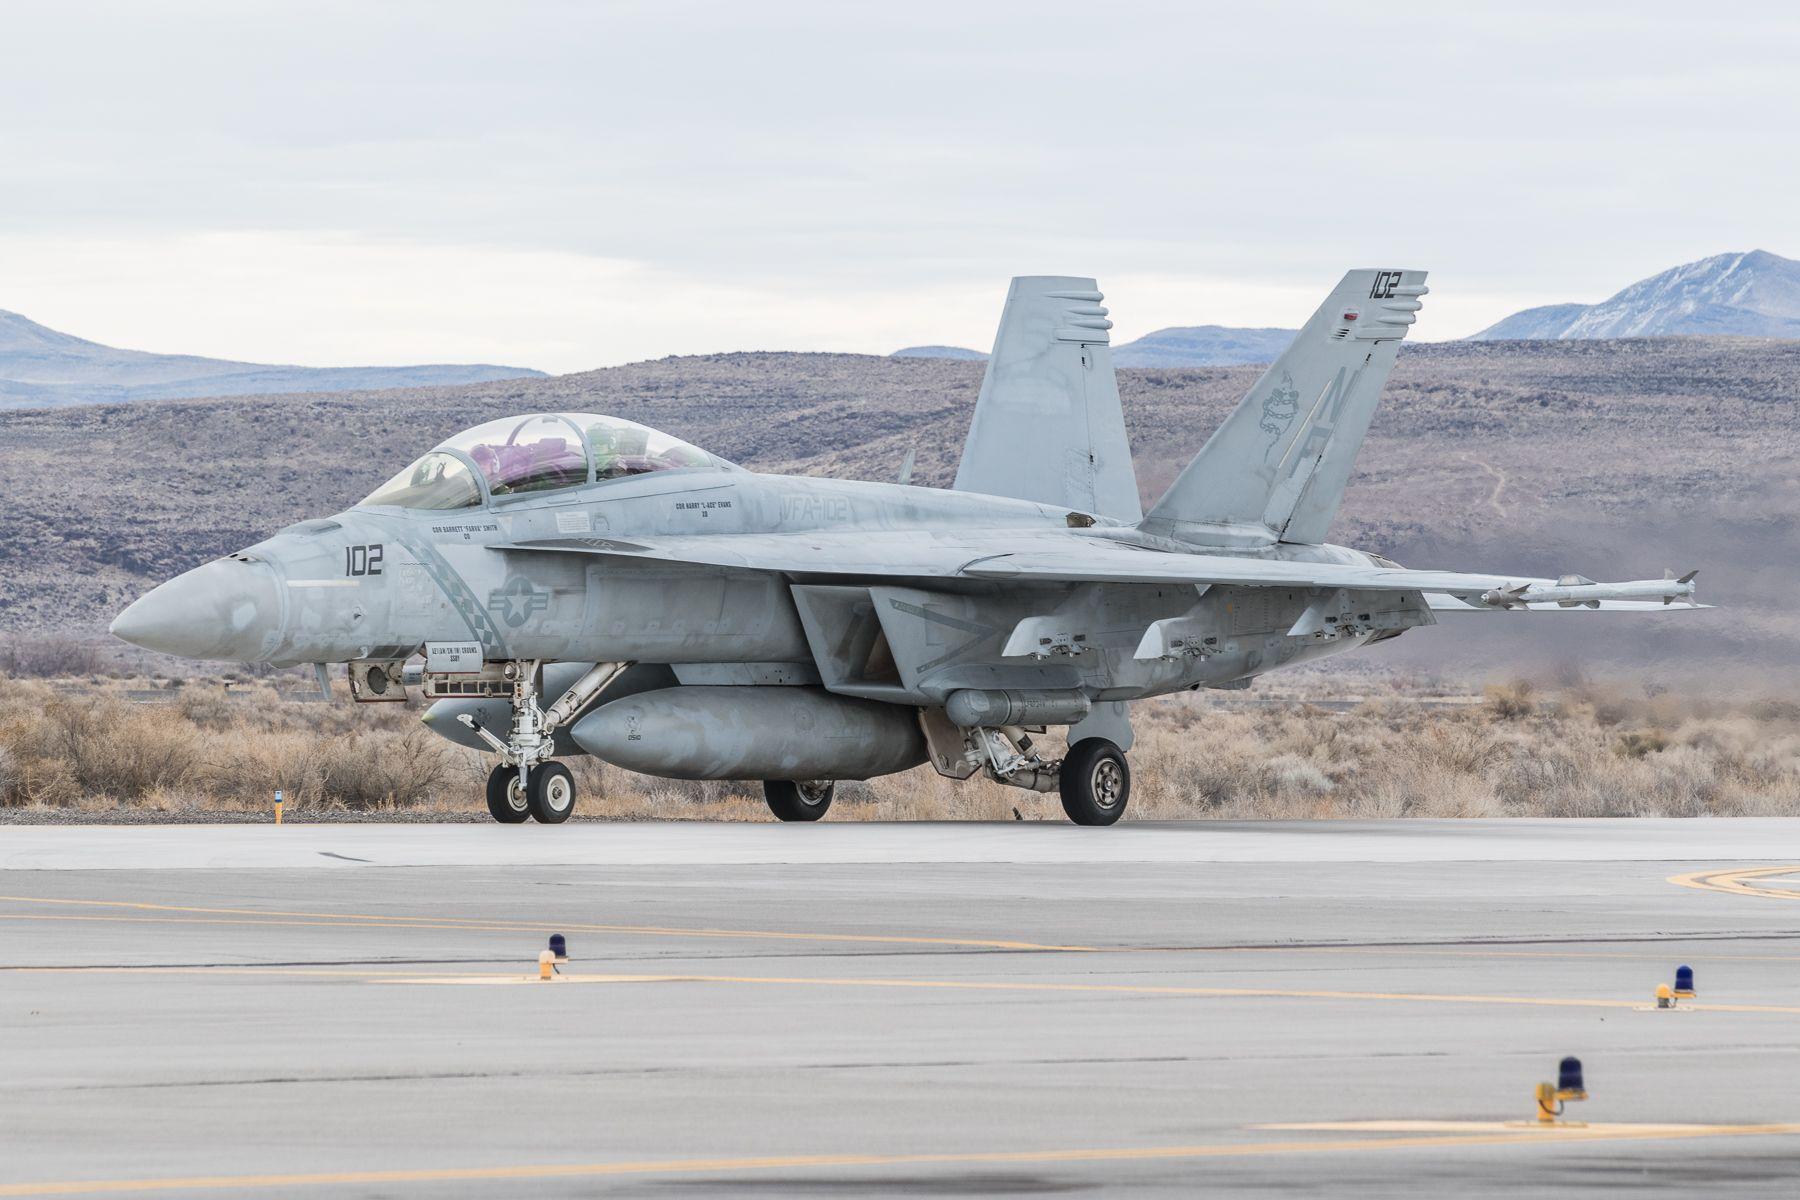 Naval Air Station Fallon NAS Fallon NAWDC TOPGUN Fighter